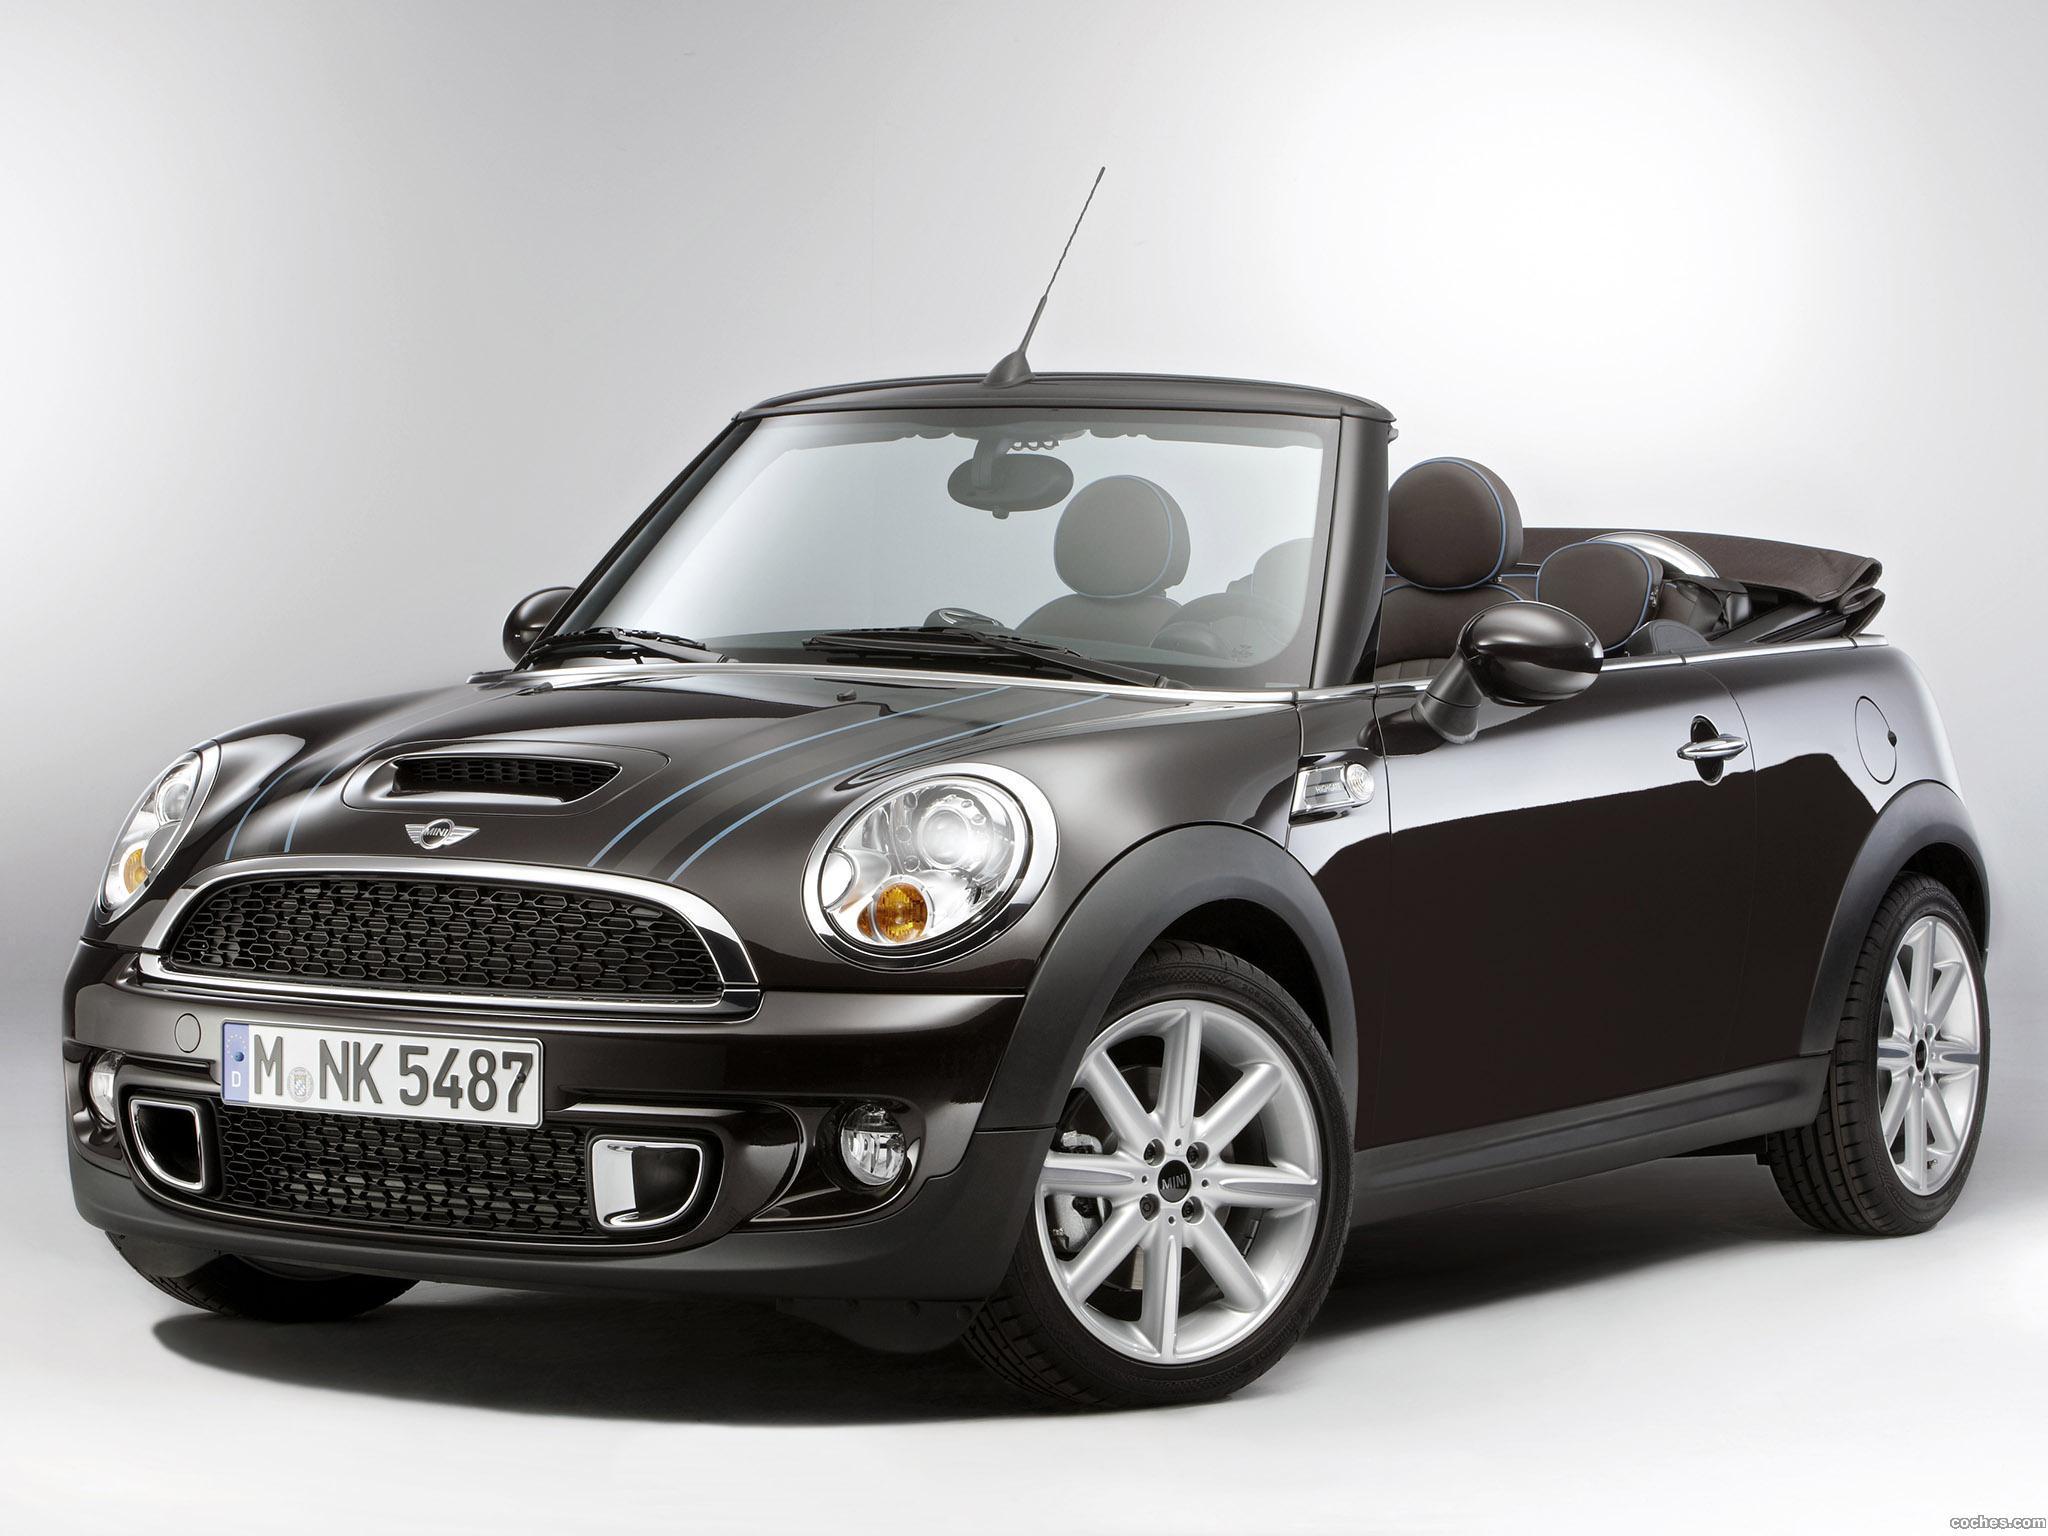 fotos de mini cooper s cabrio highgate 2012. Black Bedroom Furniture Sets. Home Design Ideas